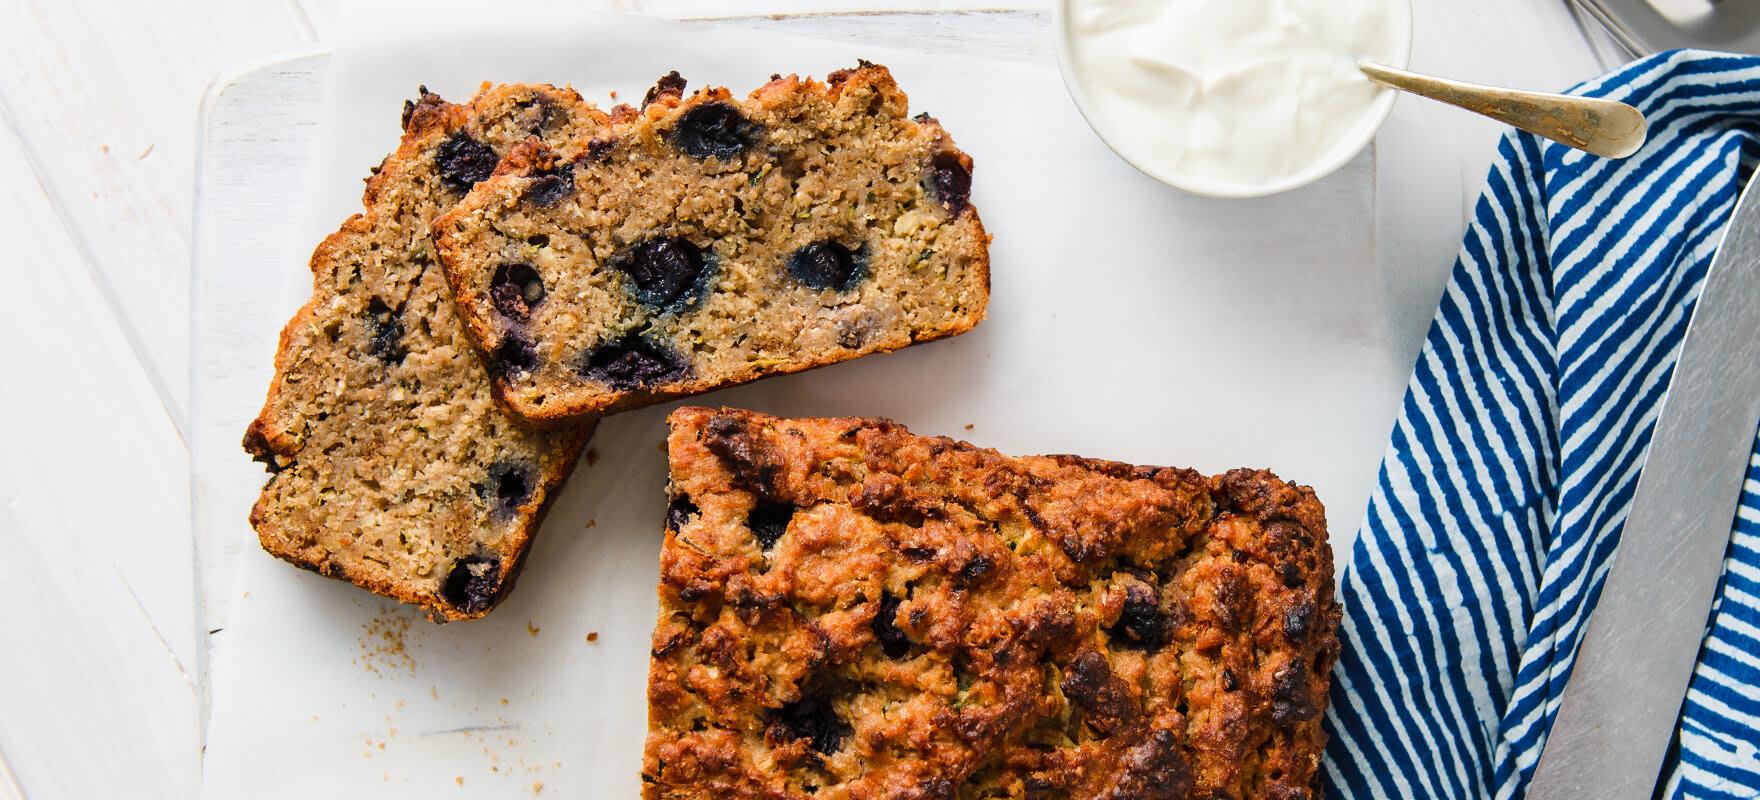 Blueberry & banana bread image 2